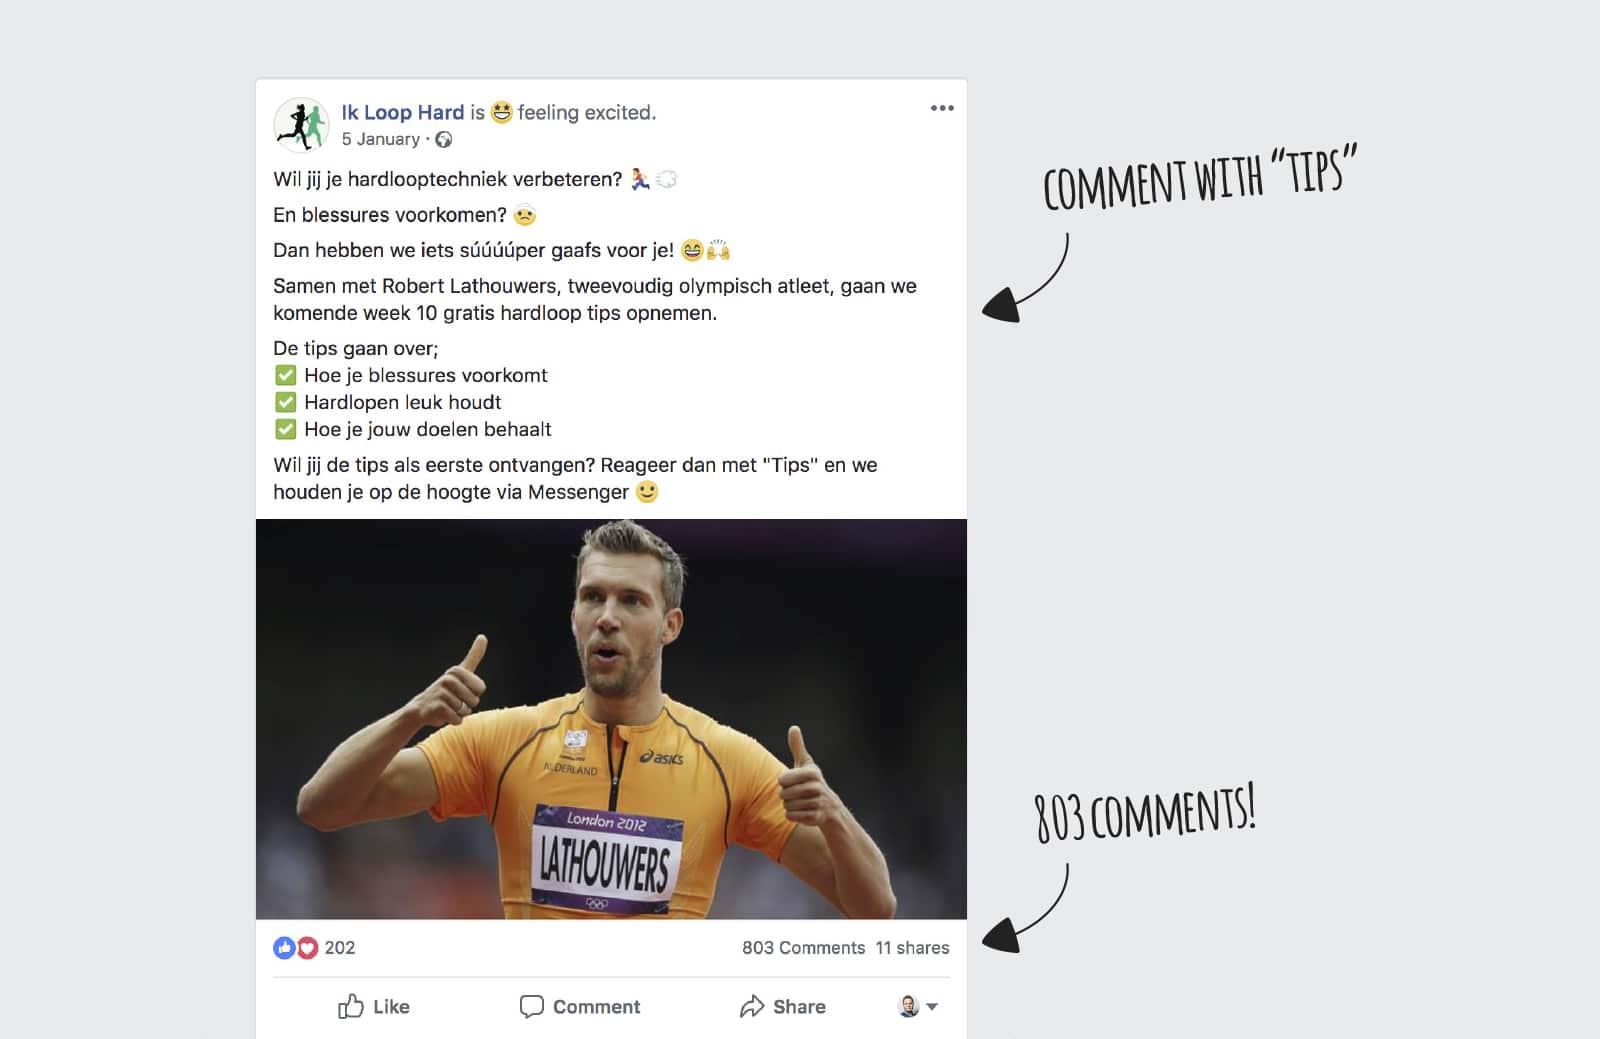 803 comments on Facebook Post triggering Messenger